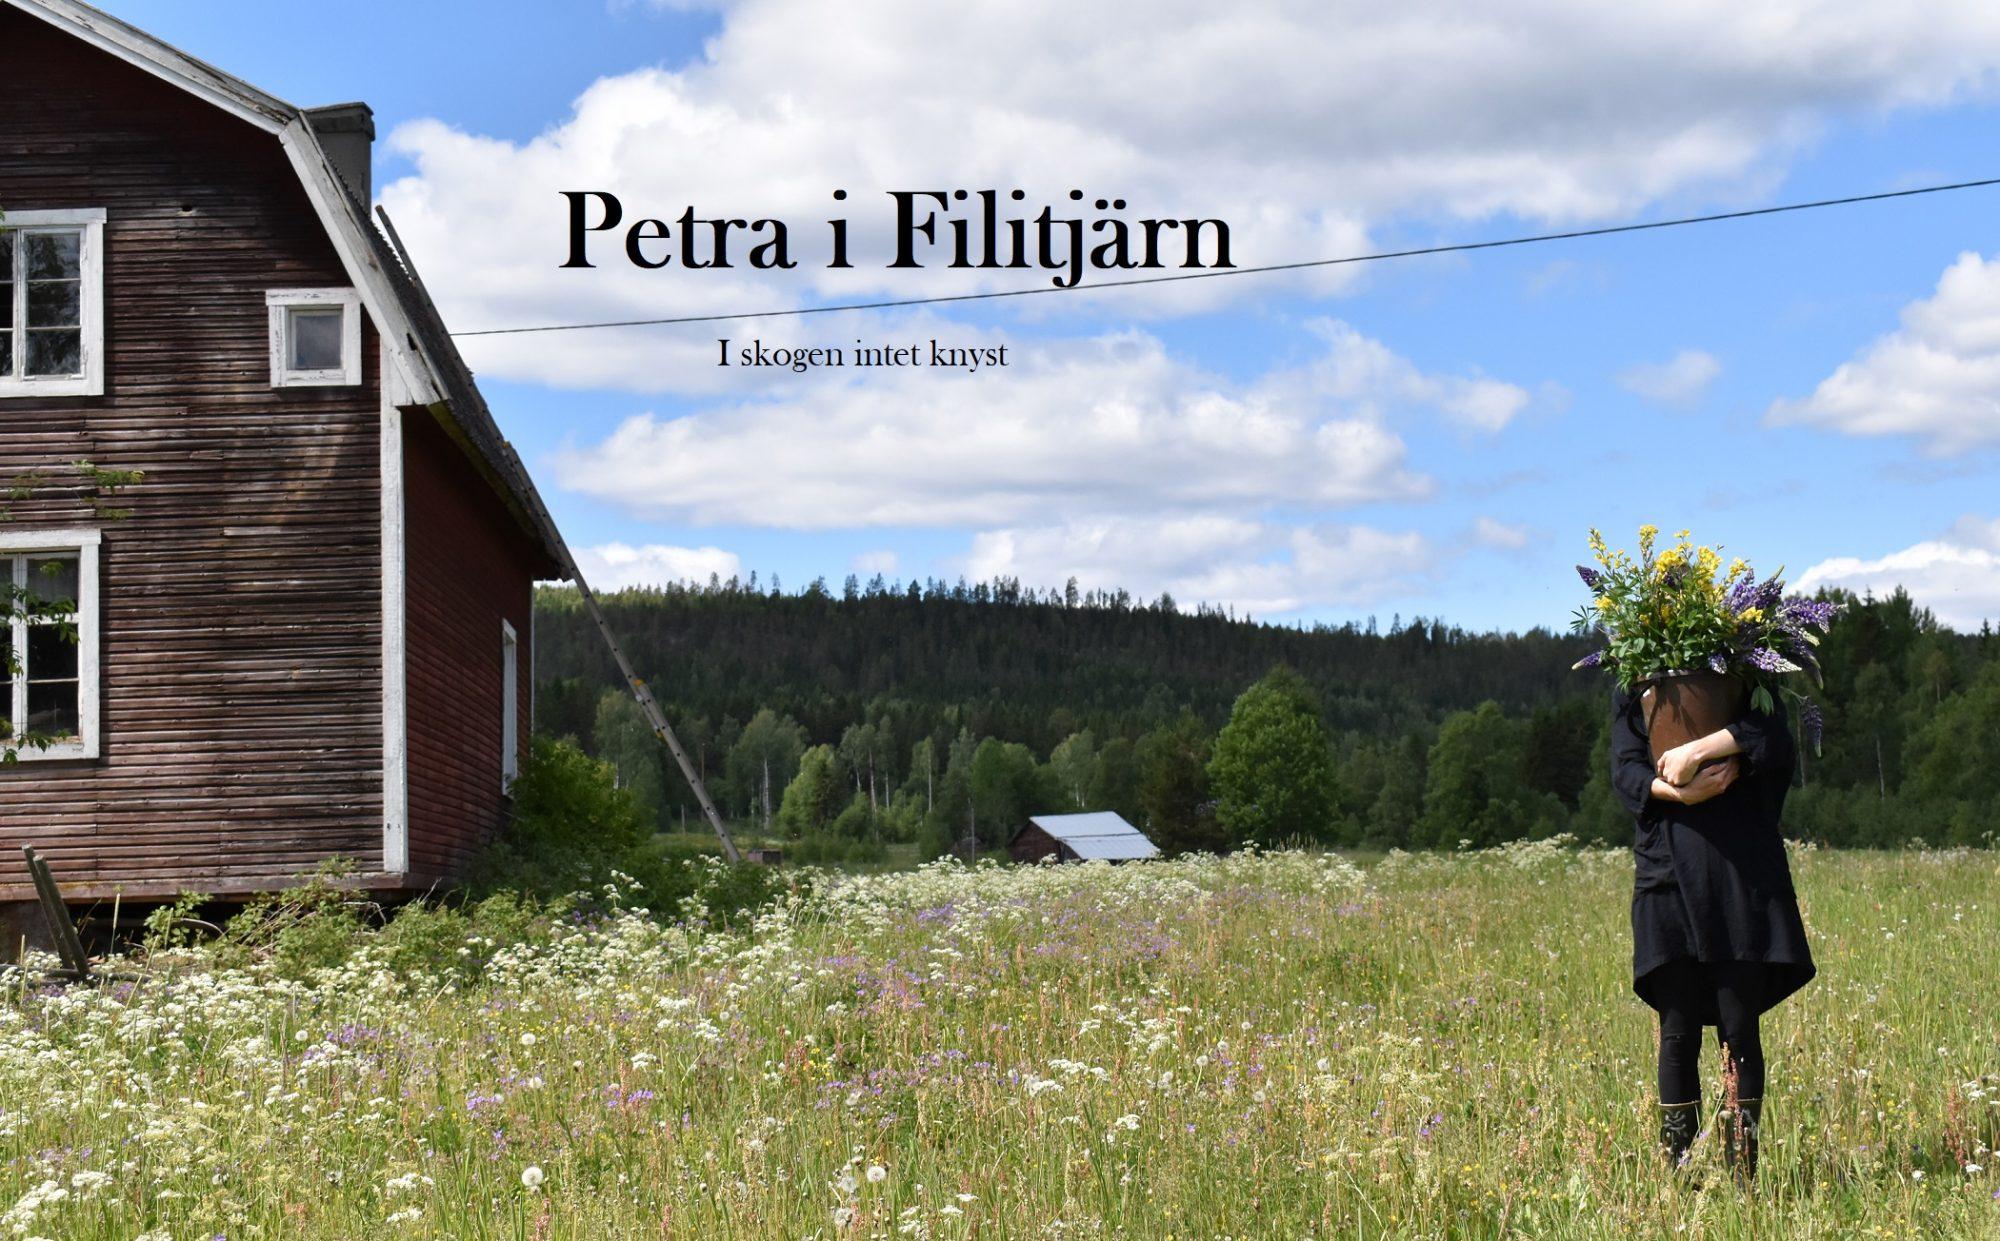 Petra i Filitjärn